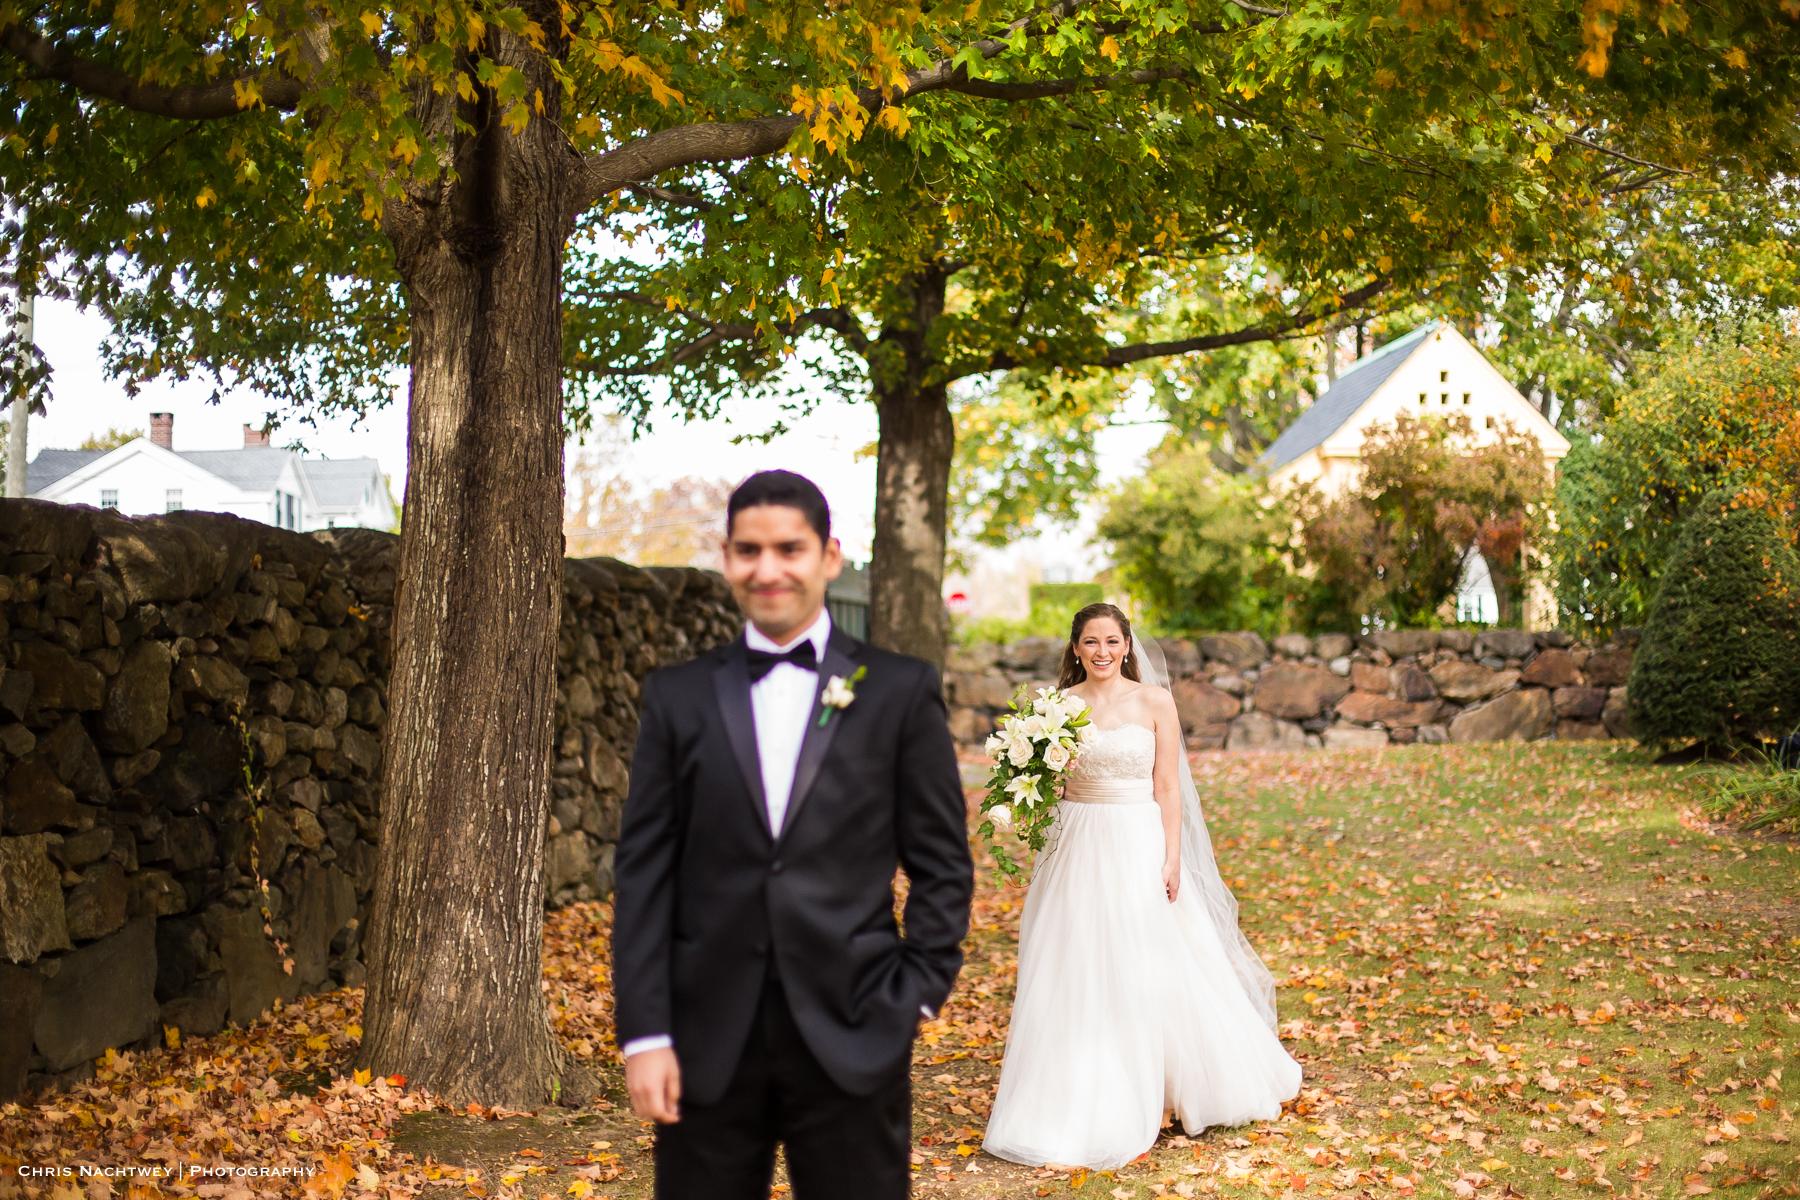 wedding-the-litchfield-inn-ct-photos-chris-nachtwey-photography-2018-17.jpg